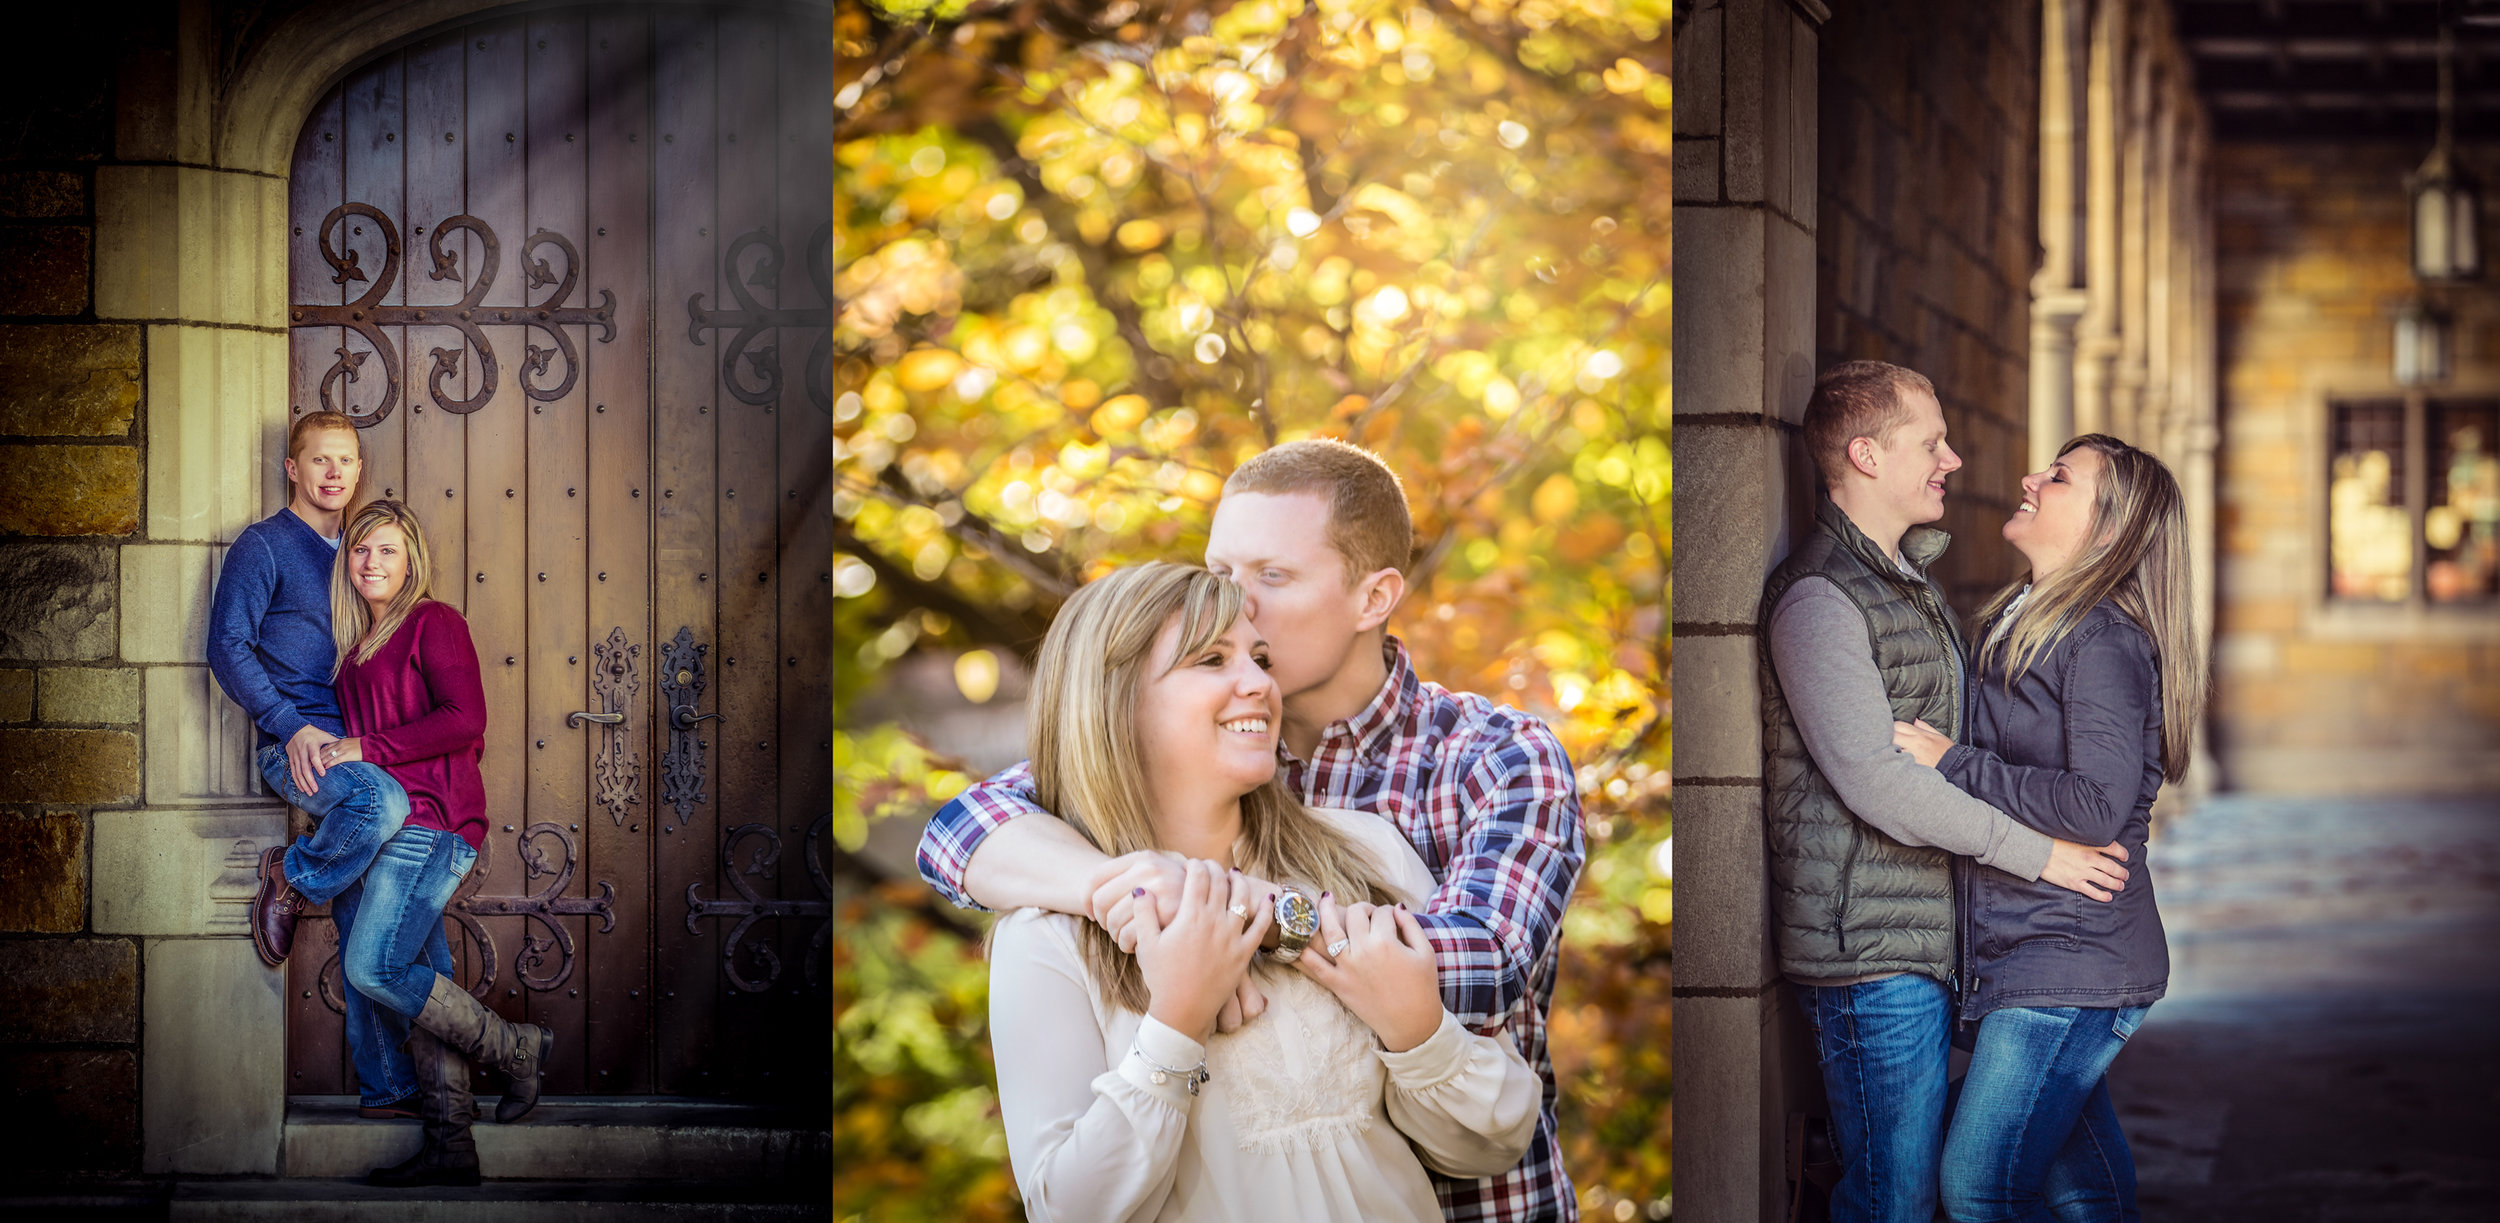 Engagement-Devon & Jason_Montage_4MPIX.jpg